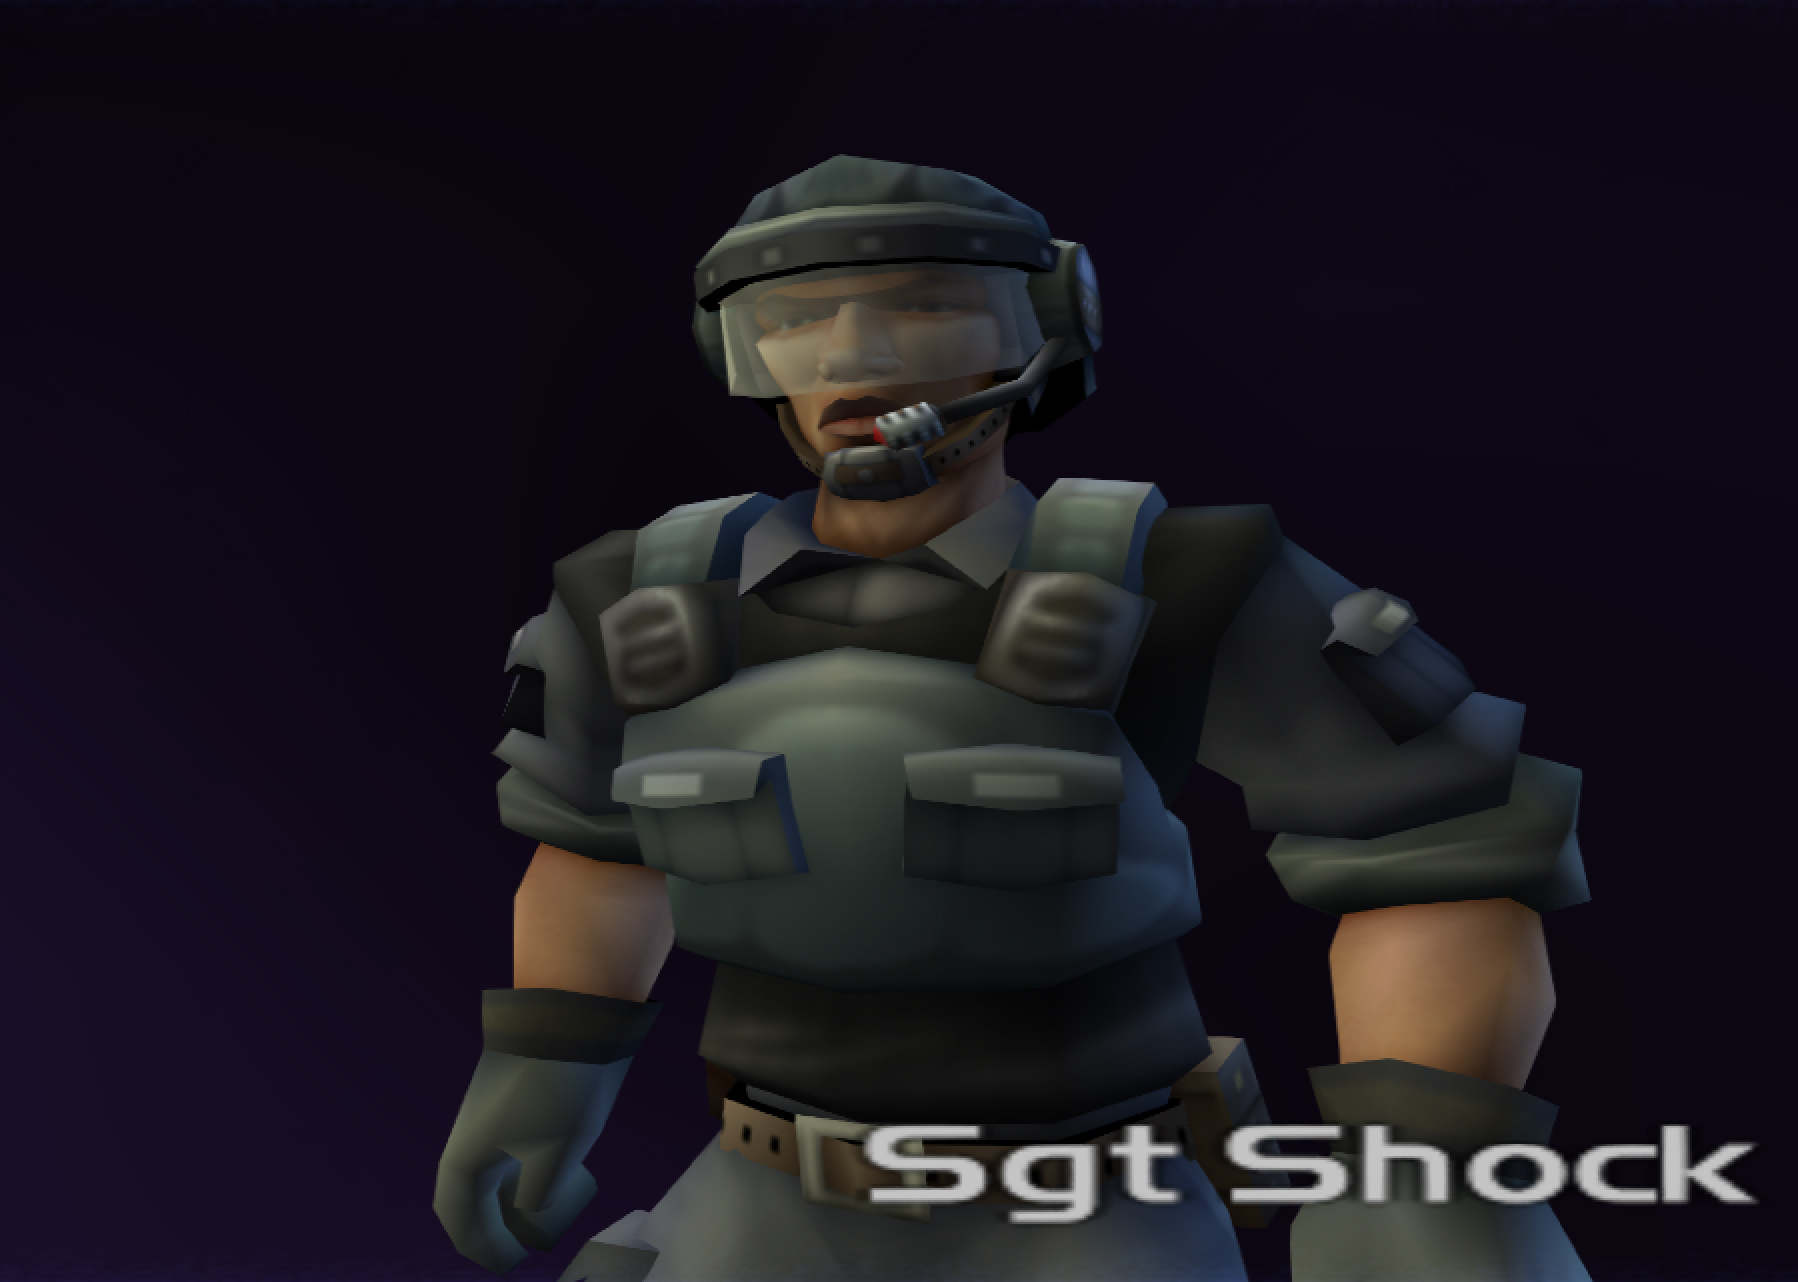 Sergeant Shock